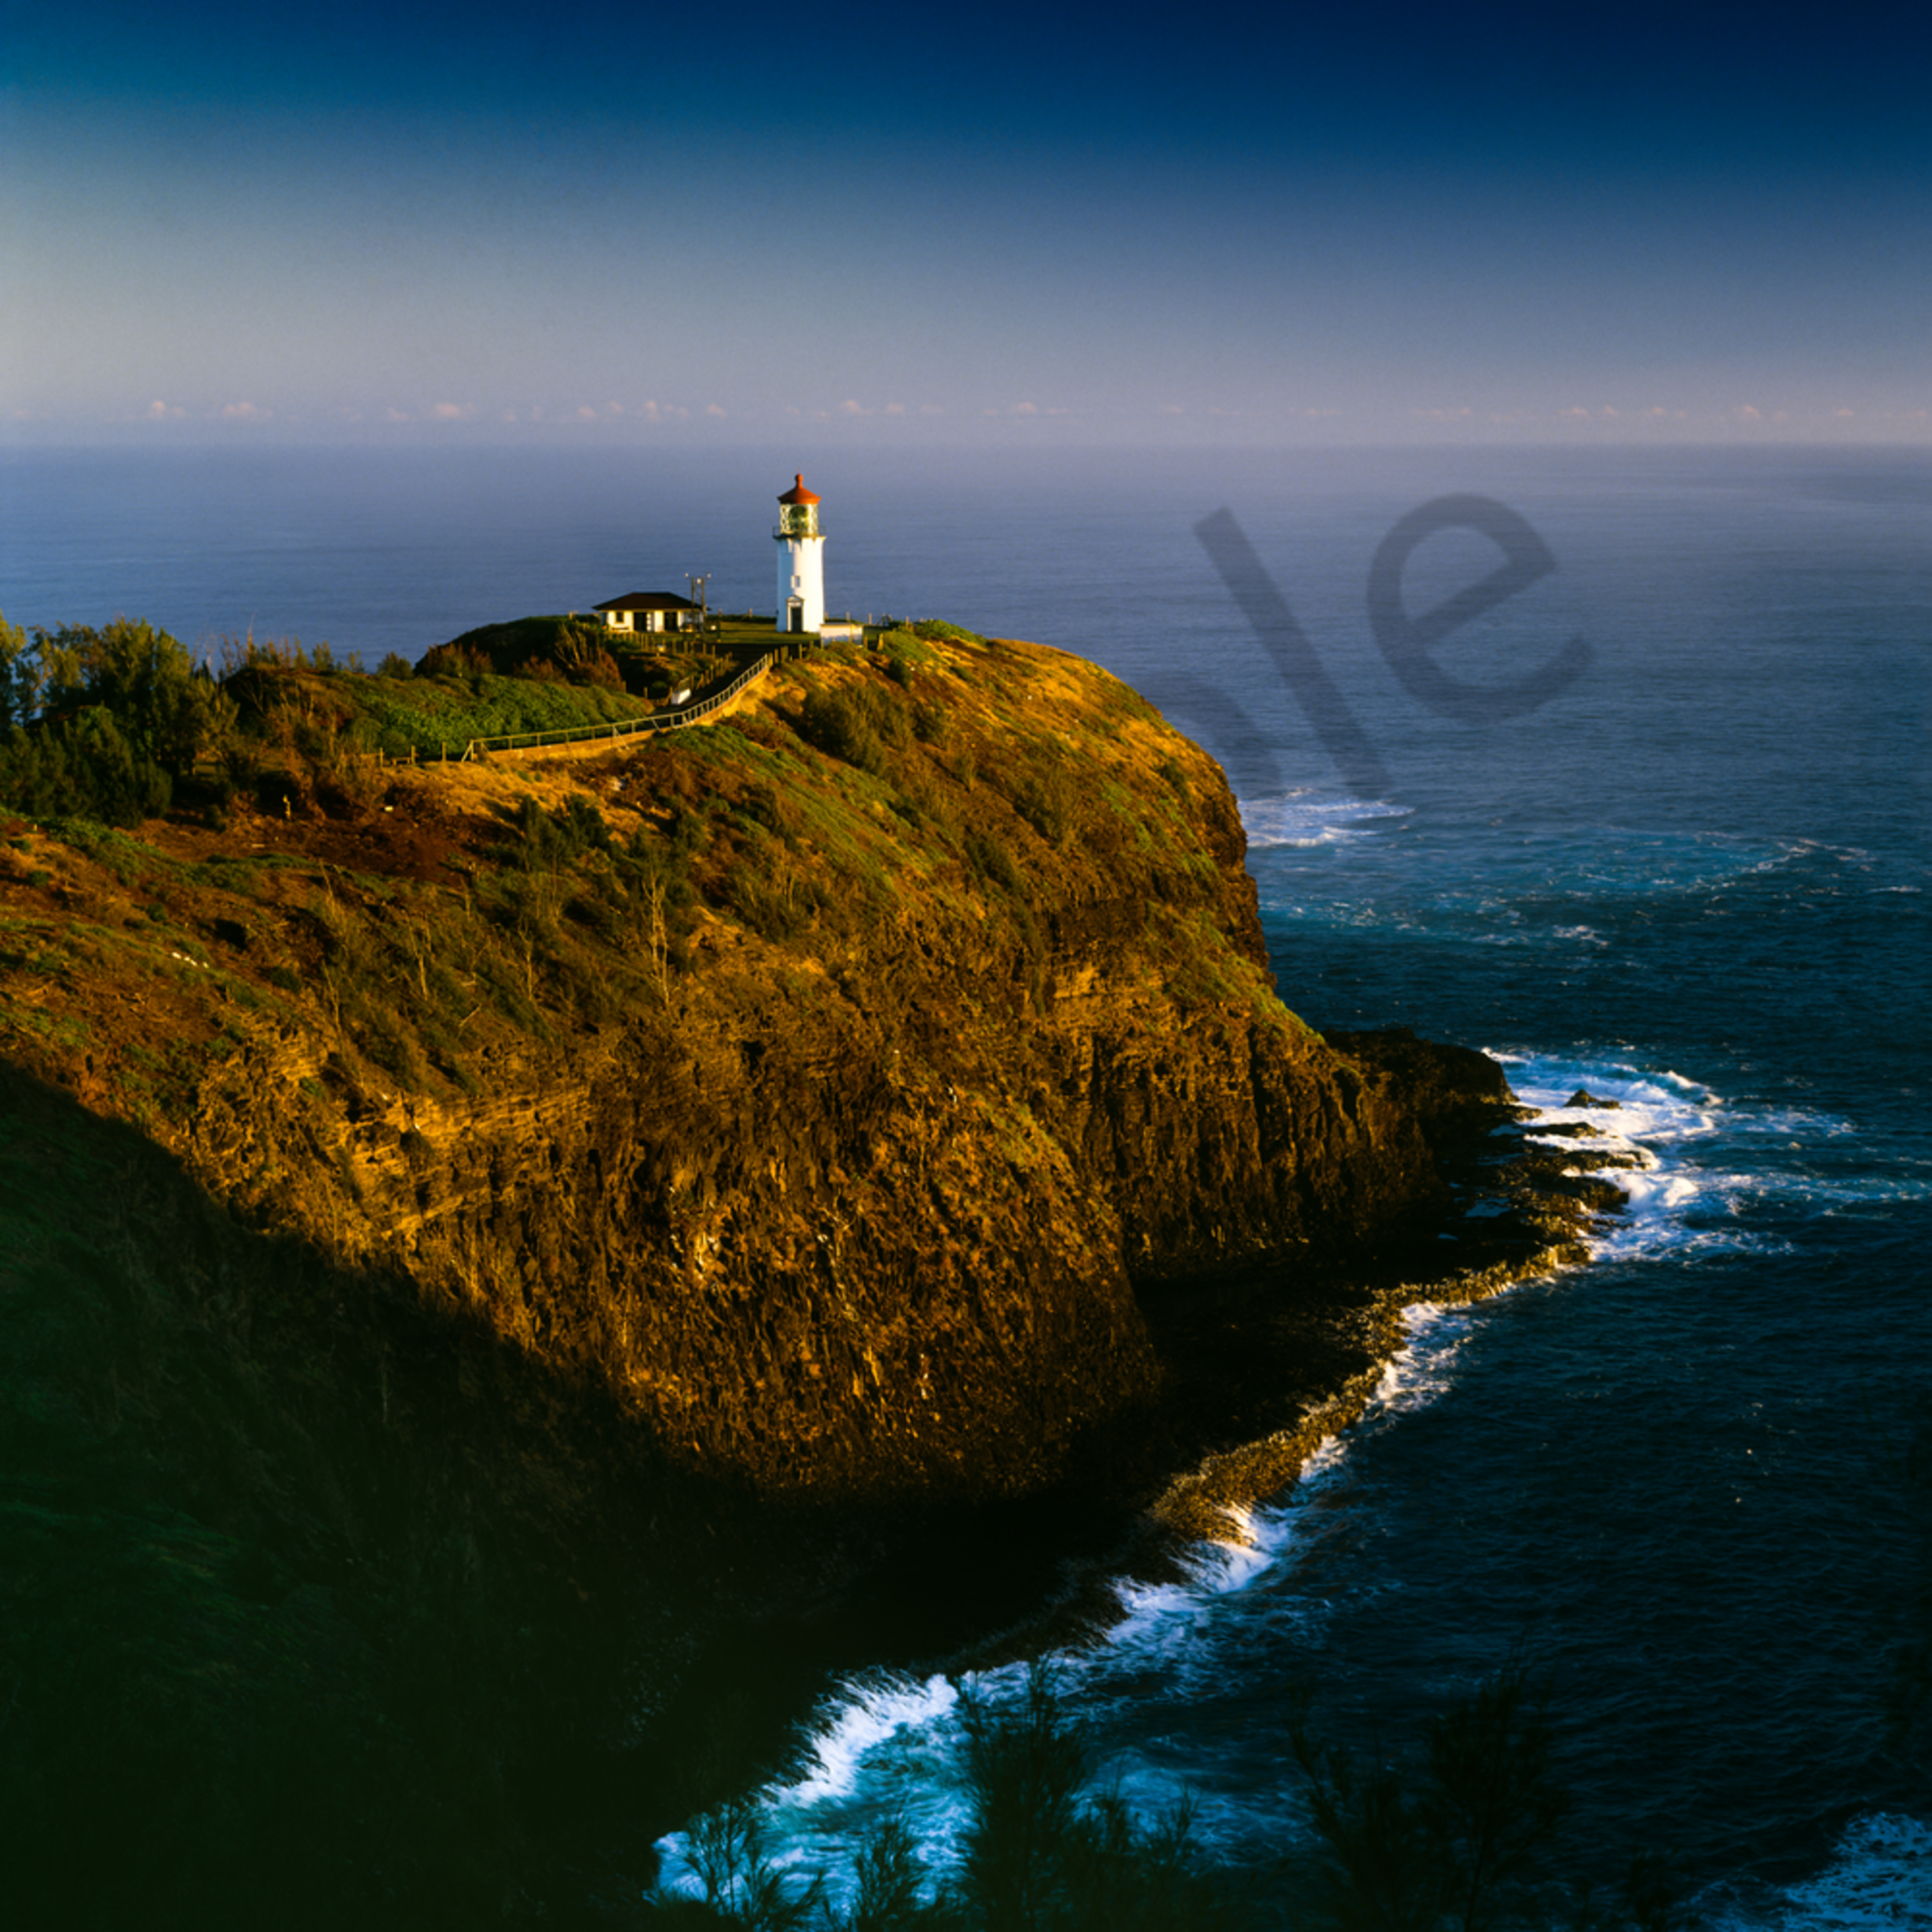 Kilauea lighthouse mqsgpw